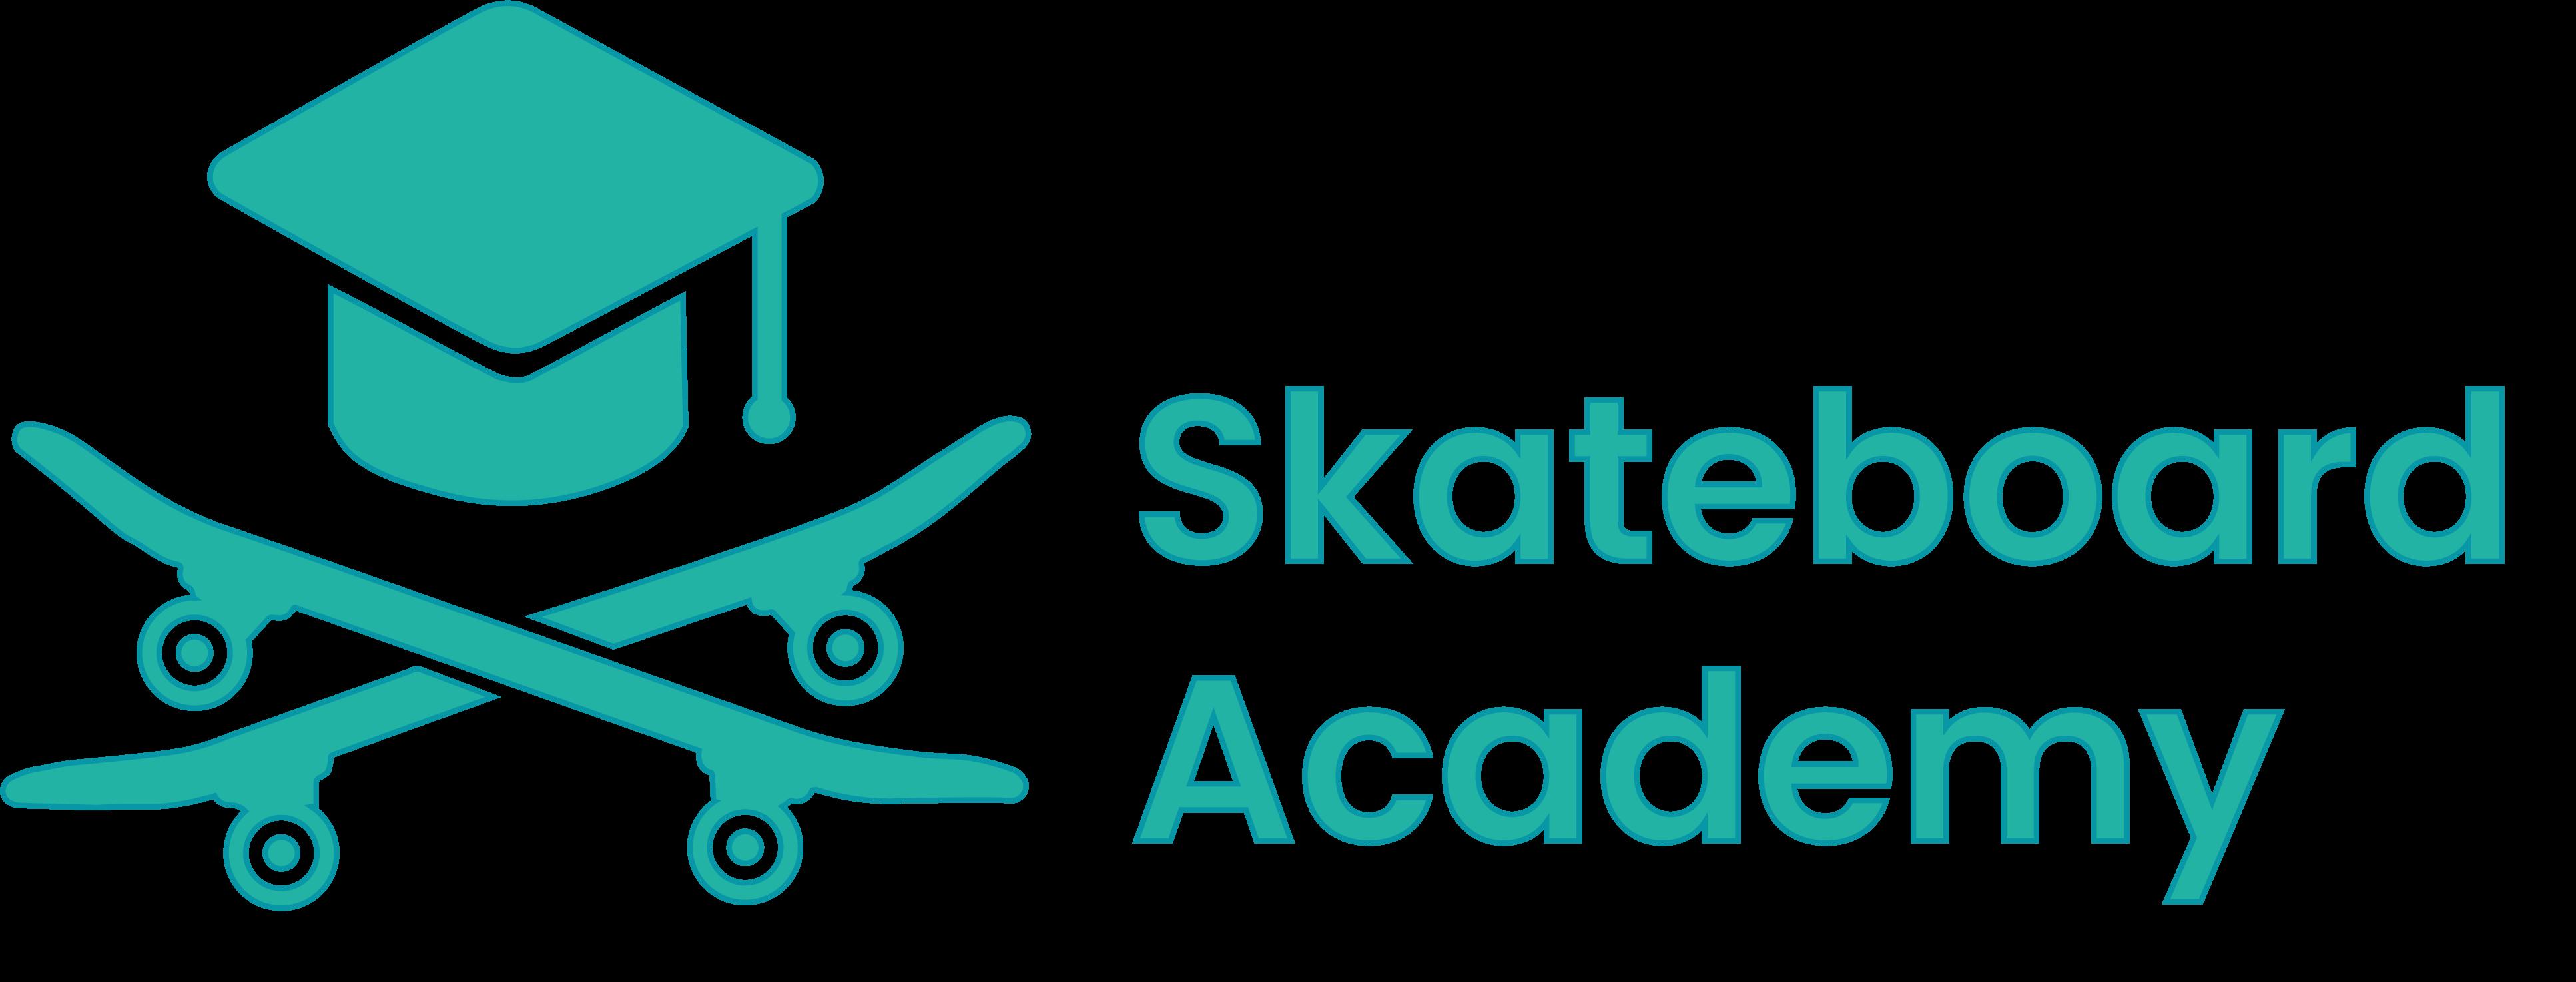 Skateboard Academy